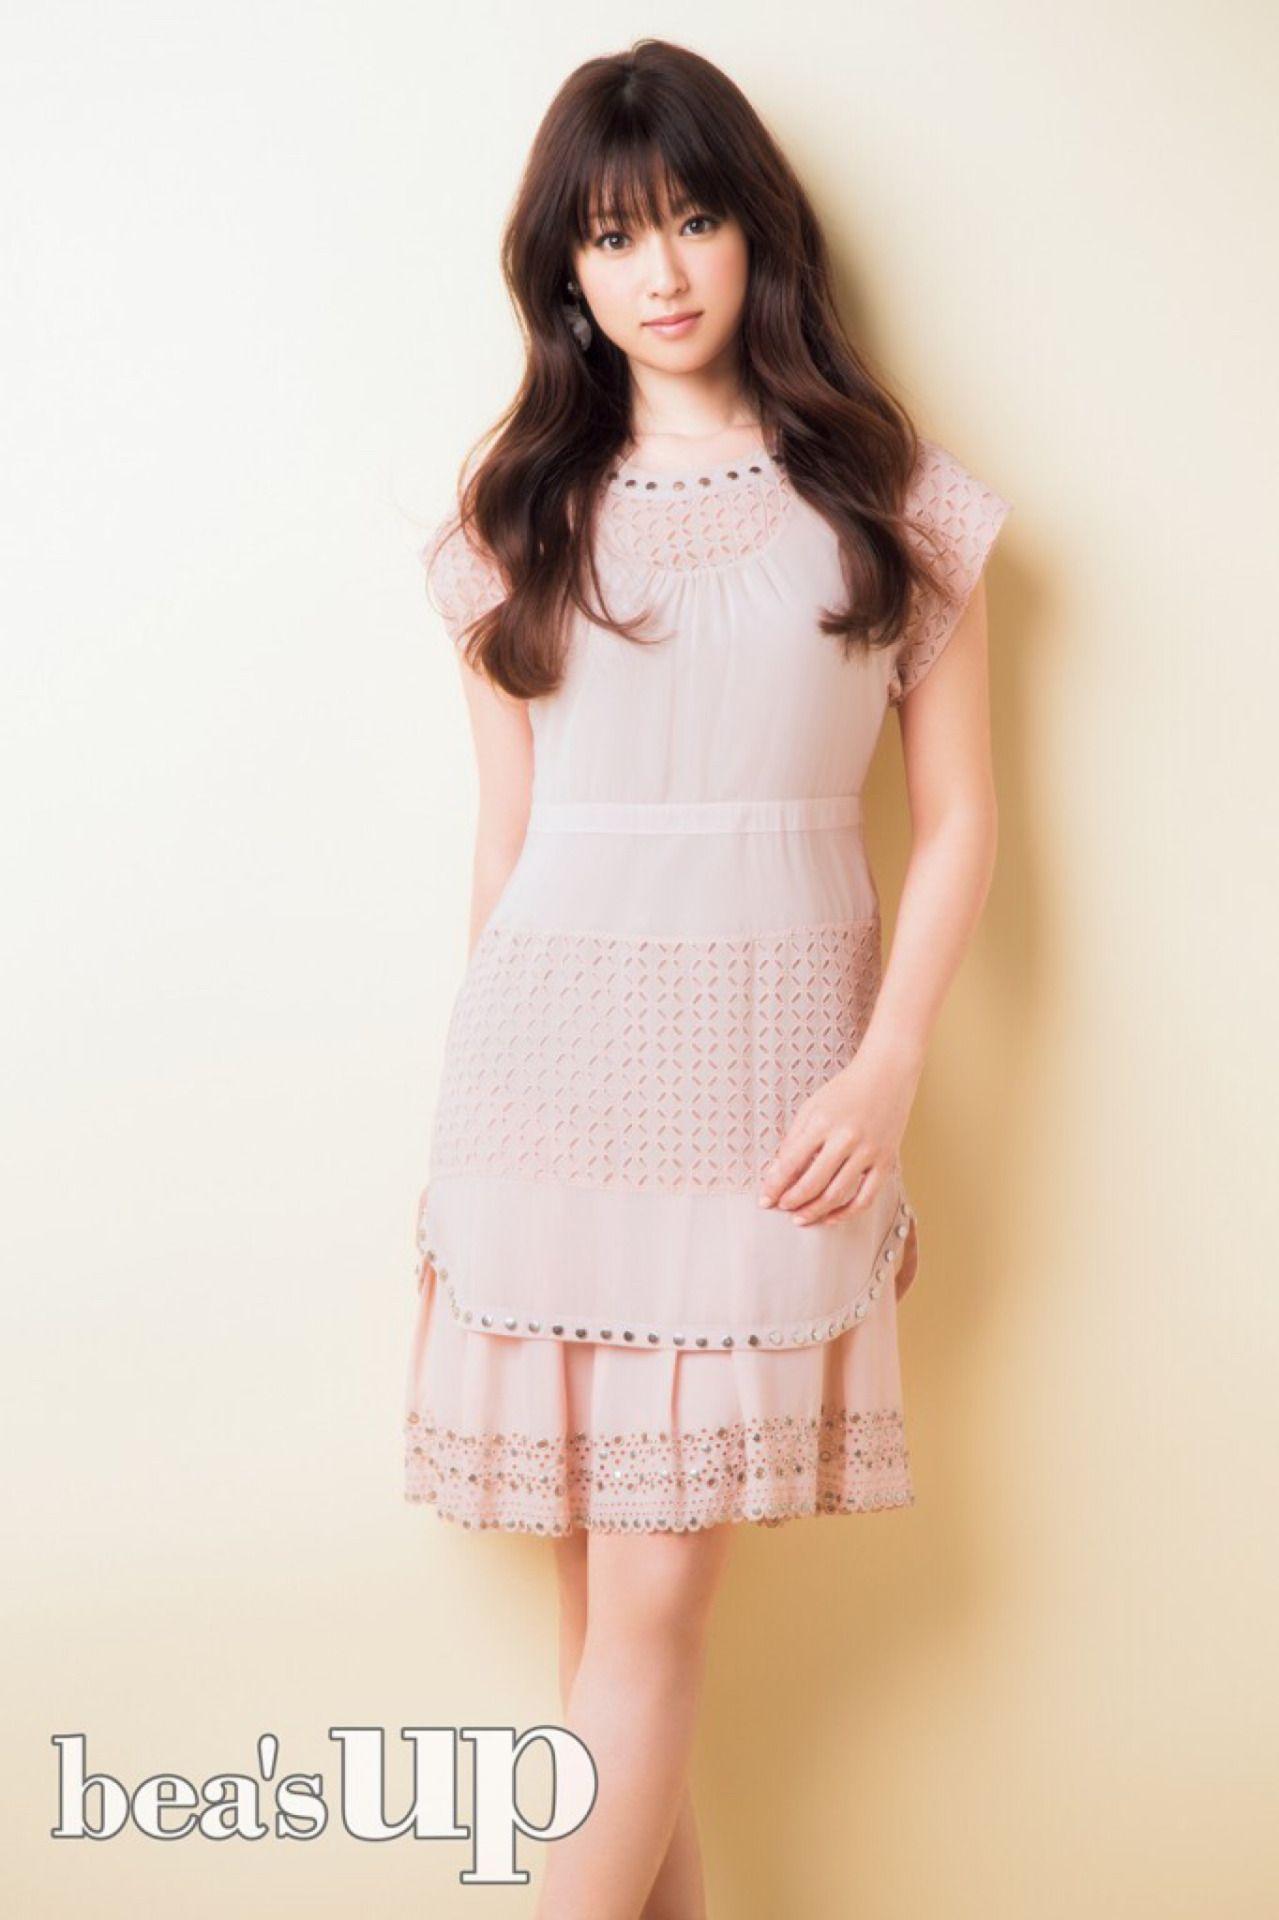 Kyoko Fukada 深田恭子 ヘアースタイル Hairstyle Pinterest Asian